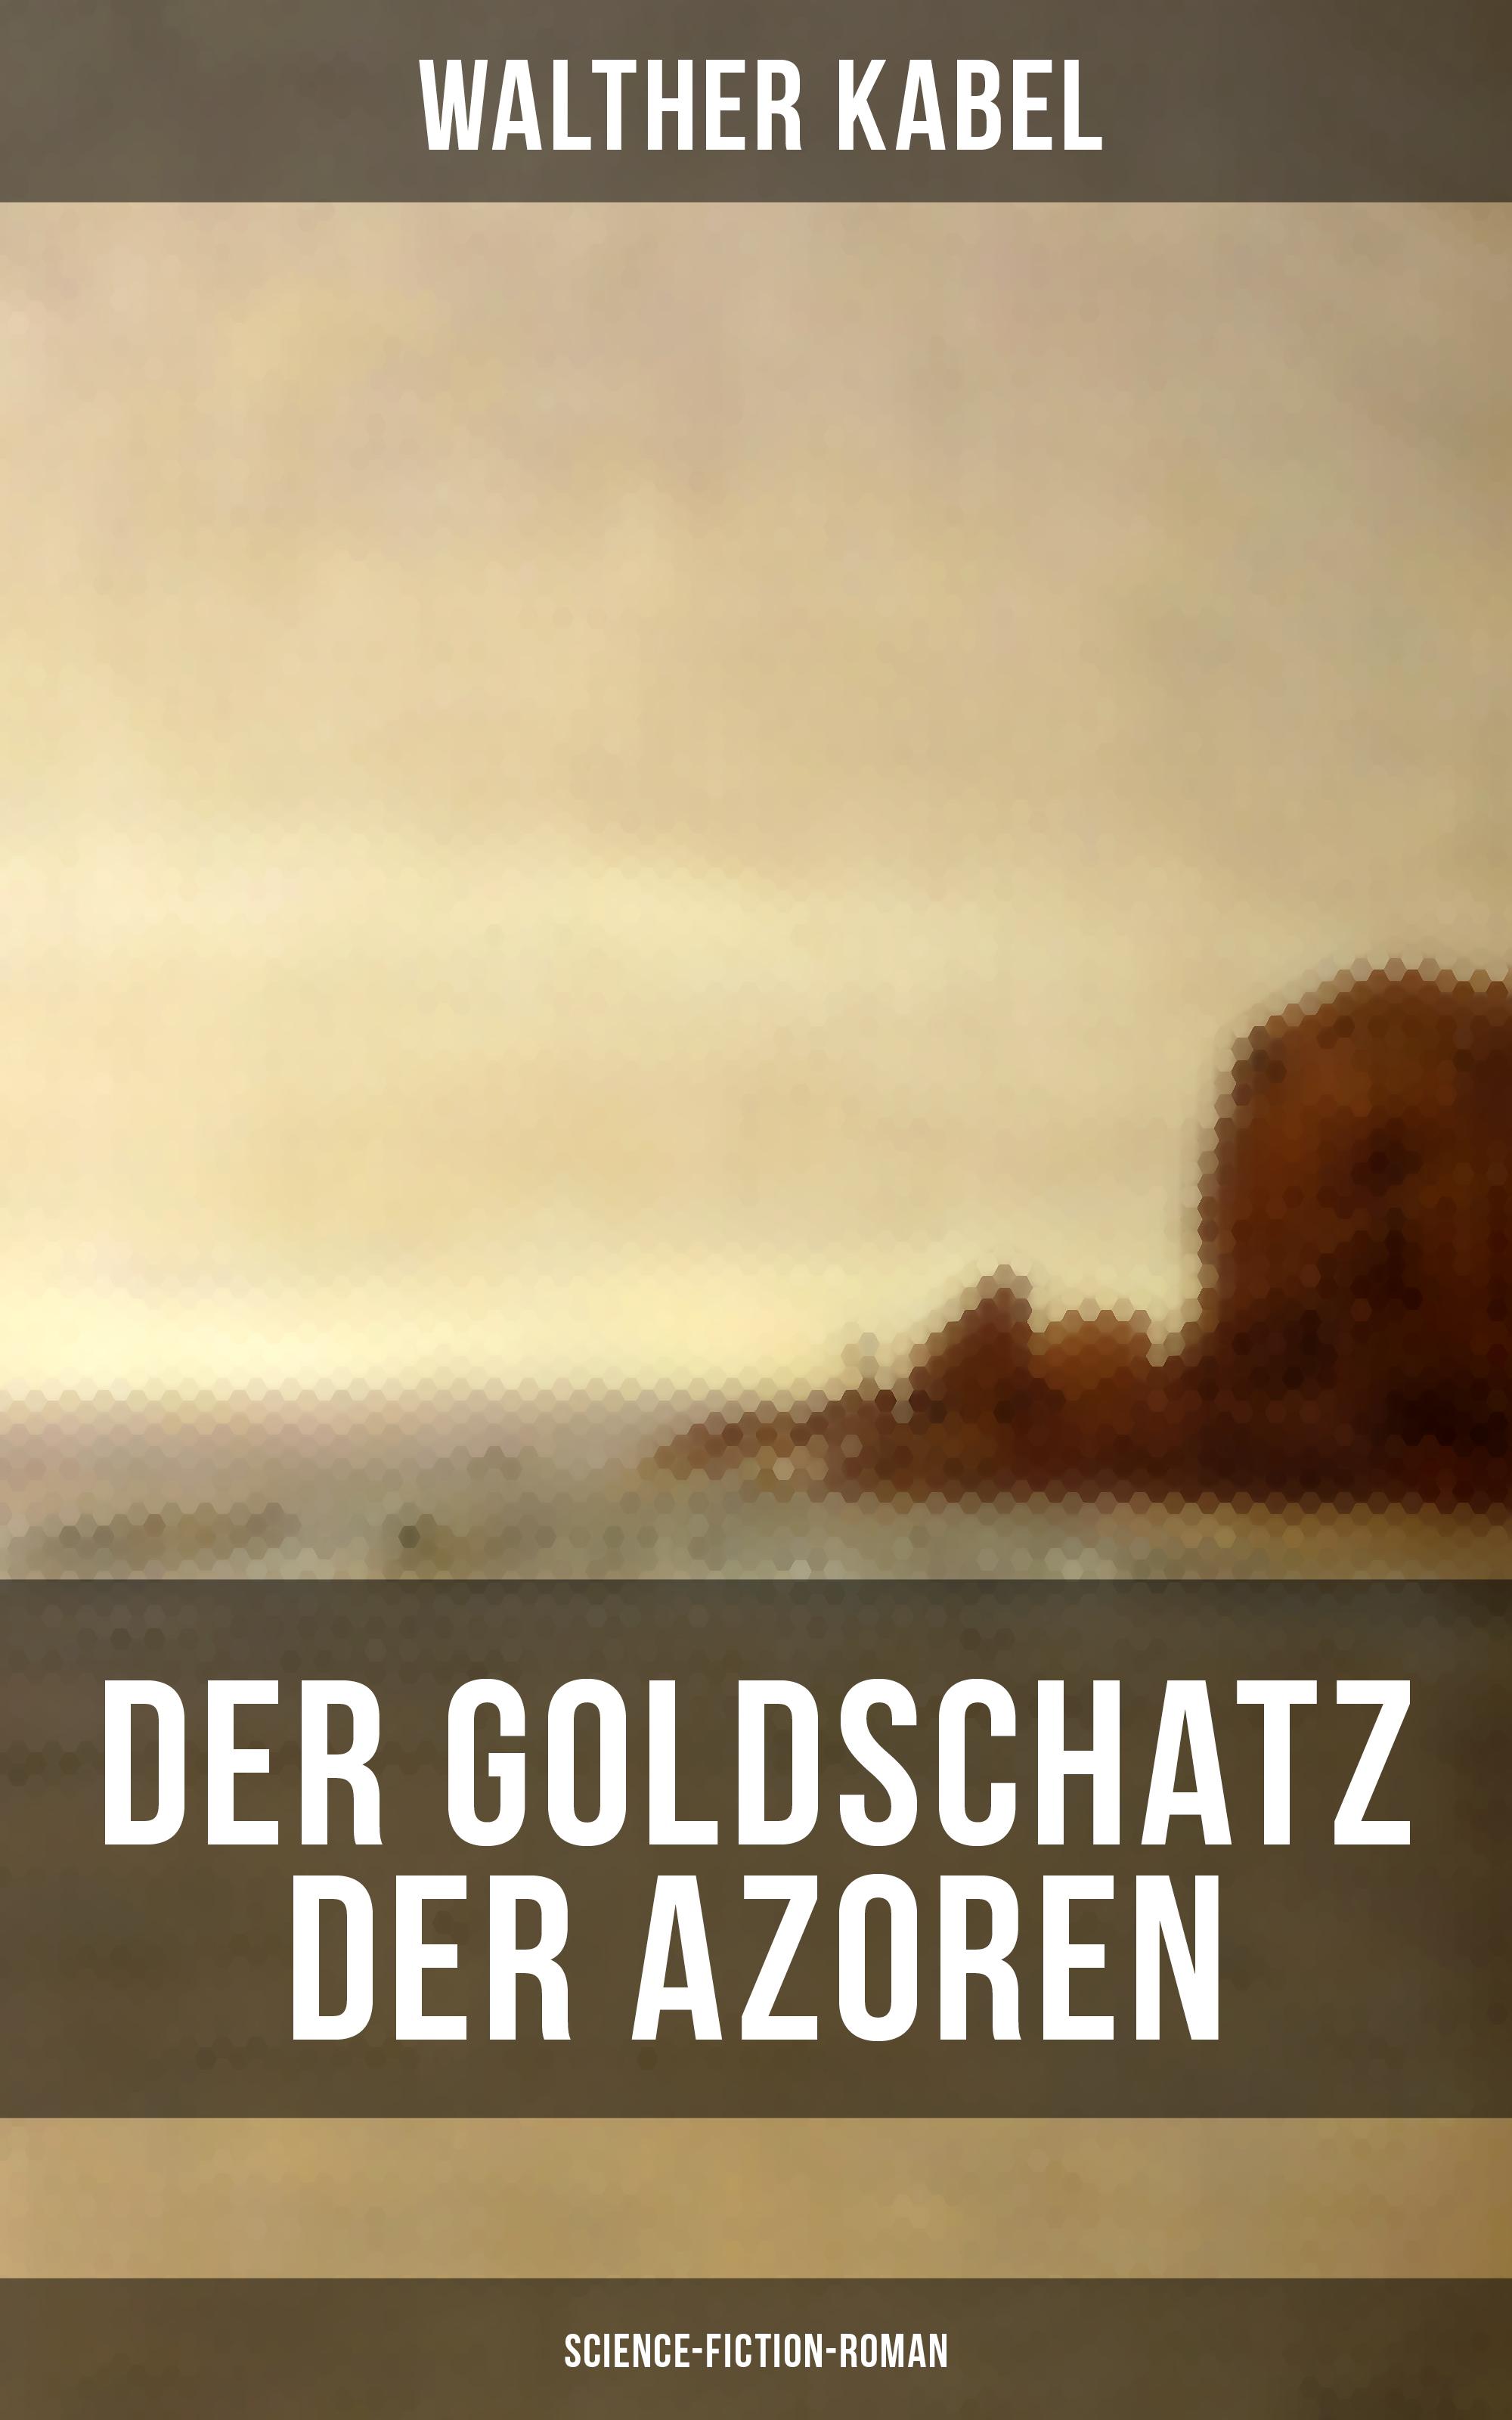 Walther Kabel Der Goldschatz der Azoren (Science-Fiction-Roman) цена 2017